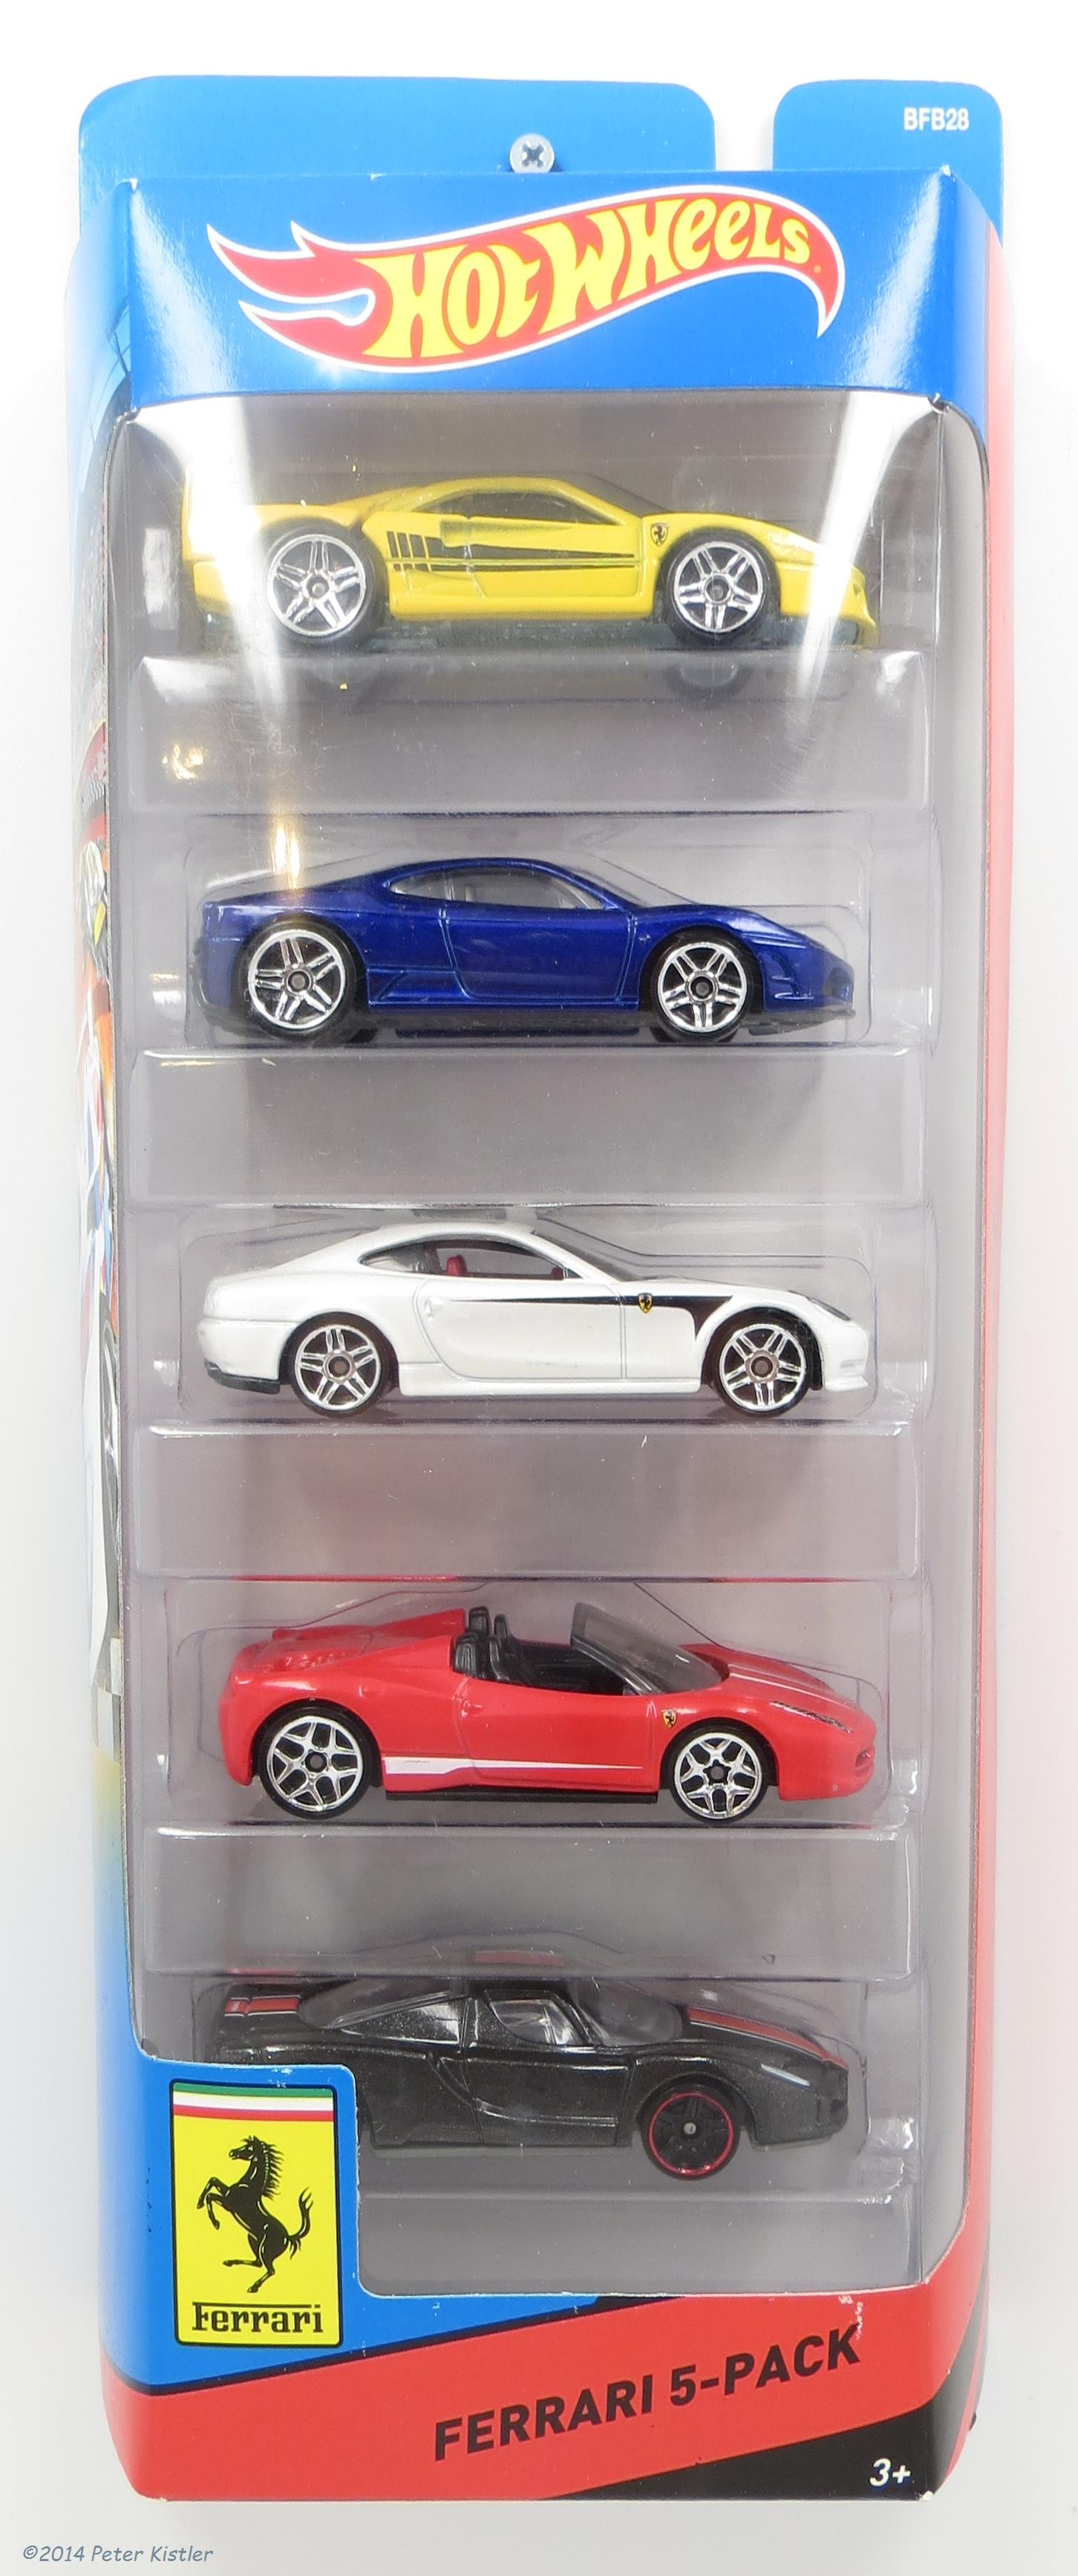 Ferrari 5-Pack (2014)